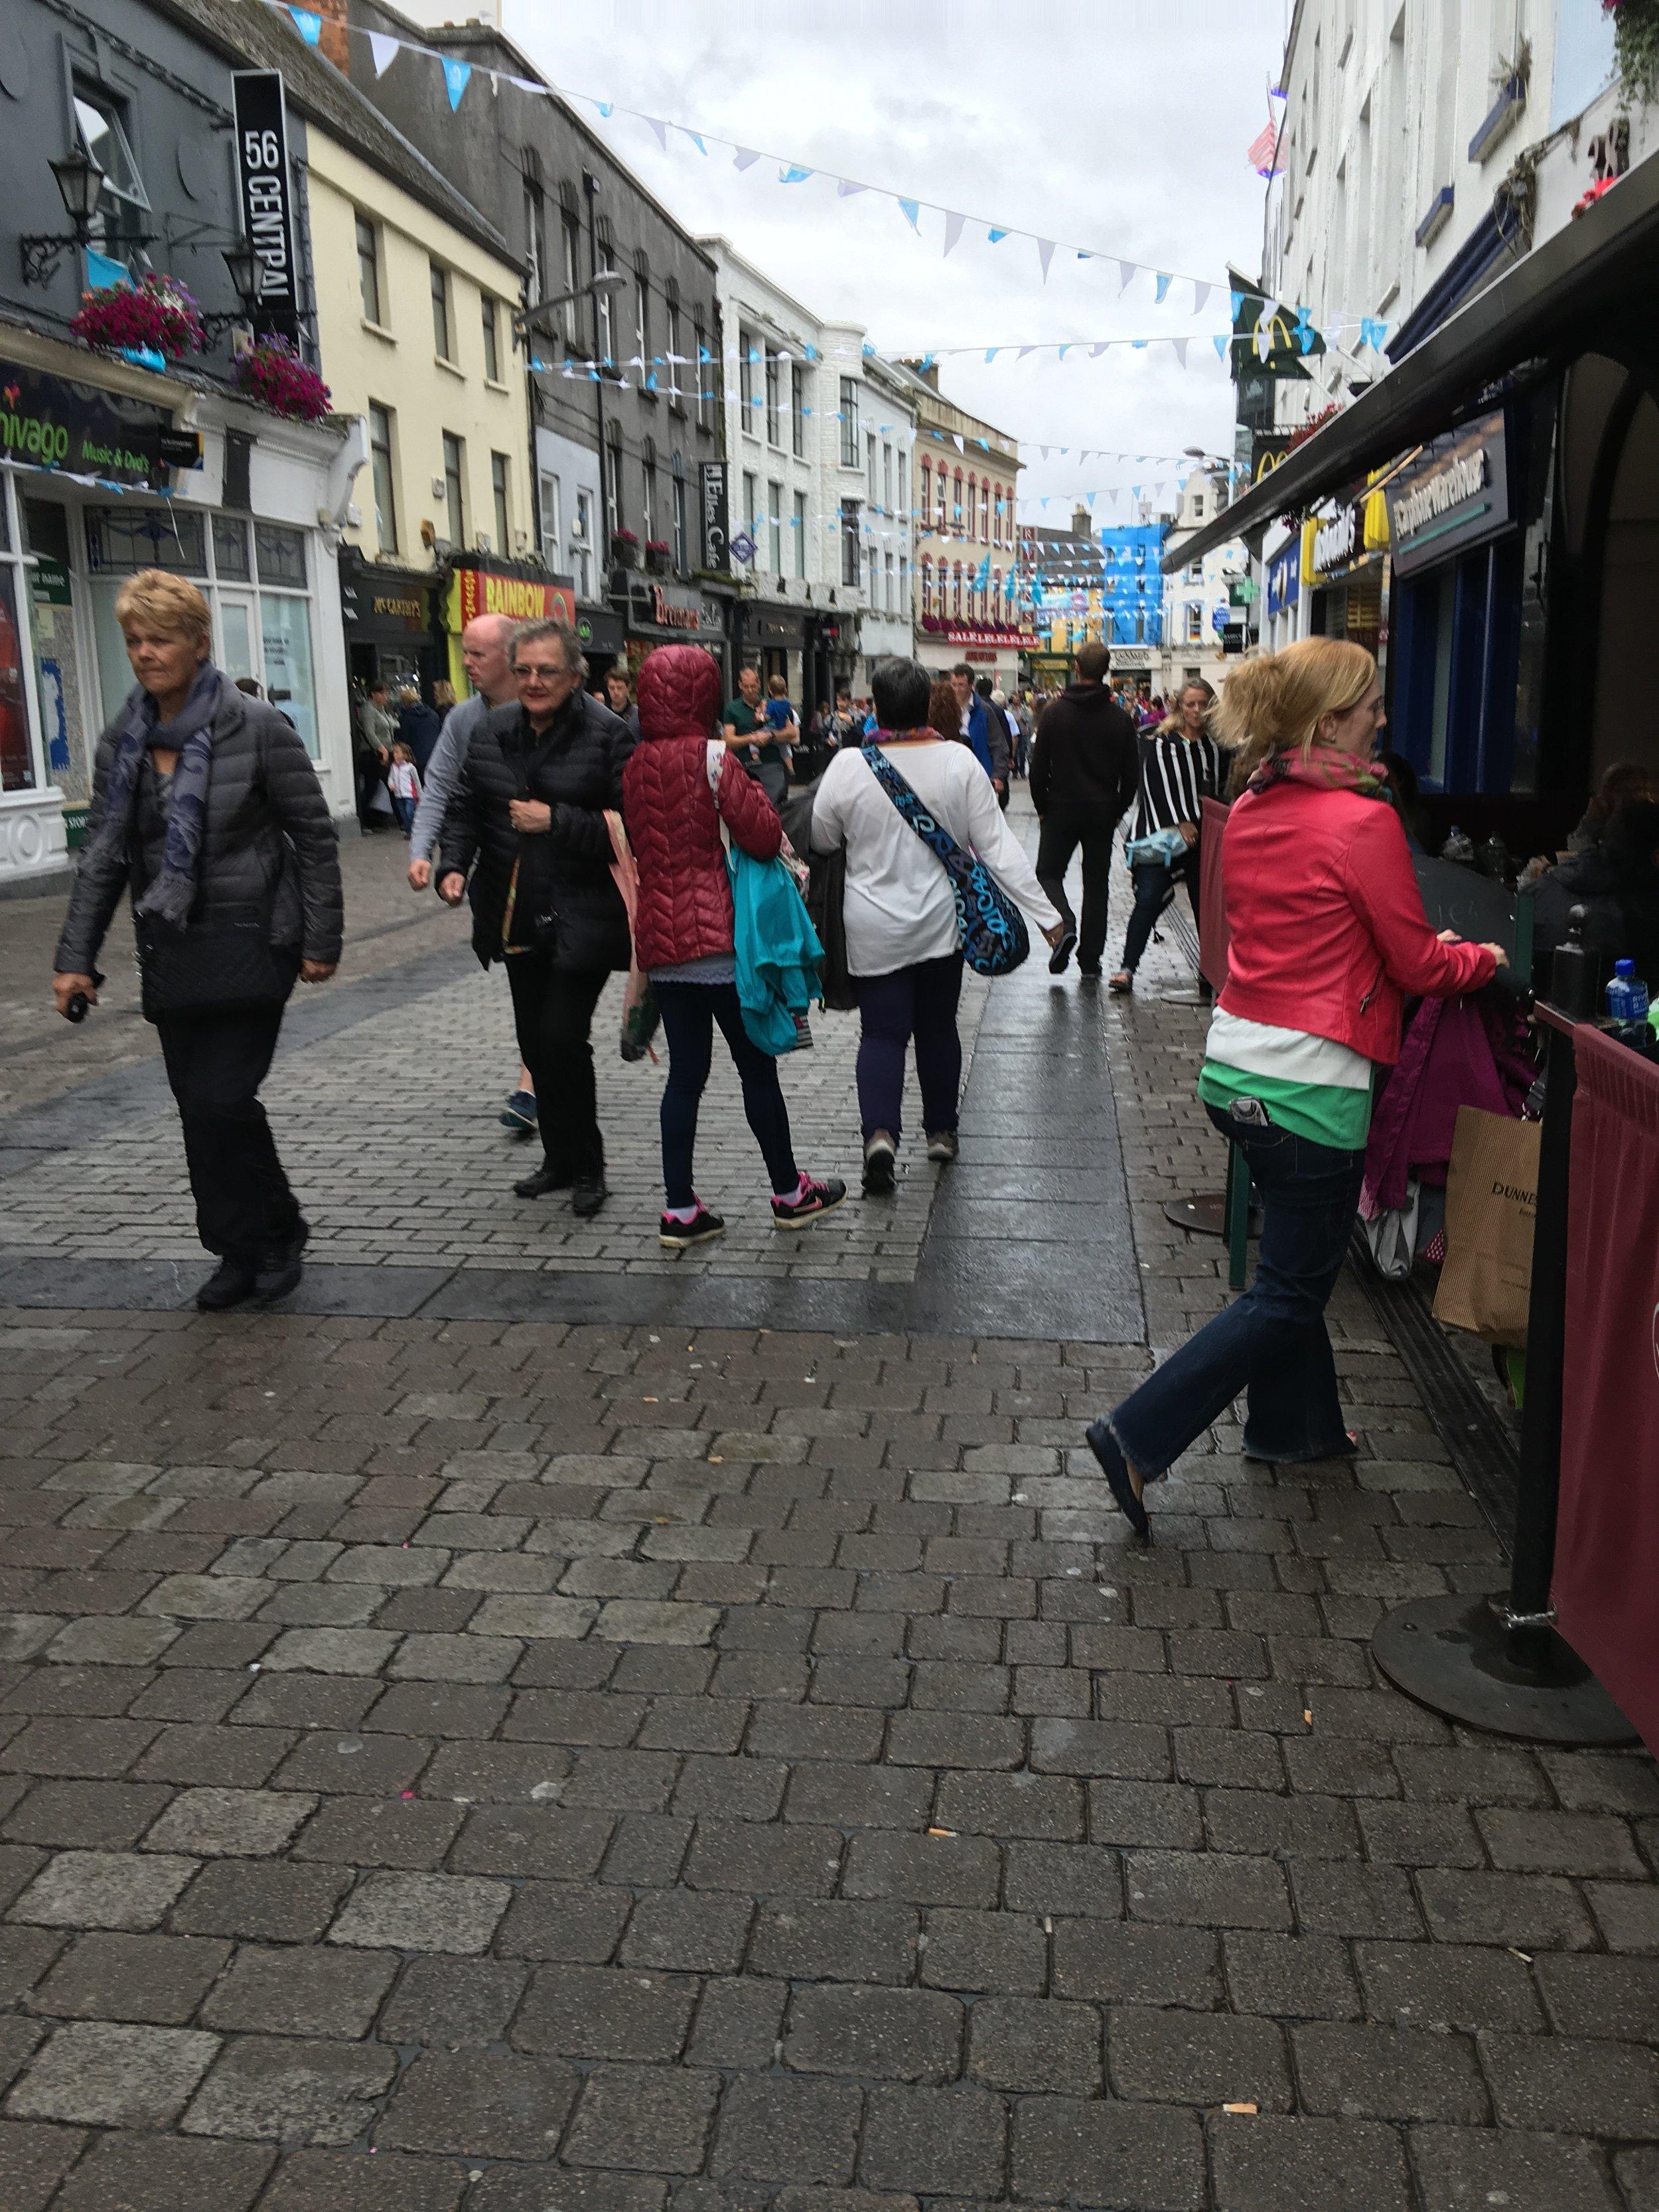 Gallway, Ireland